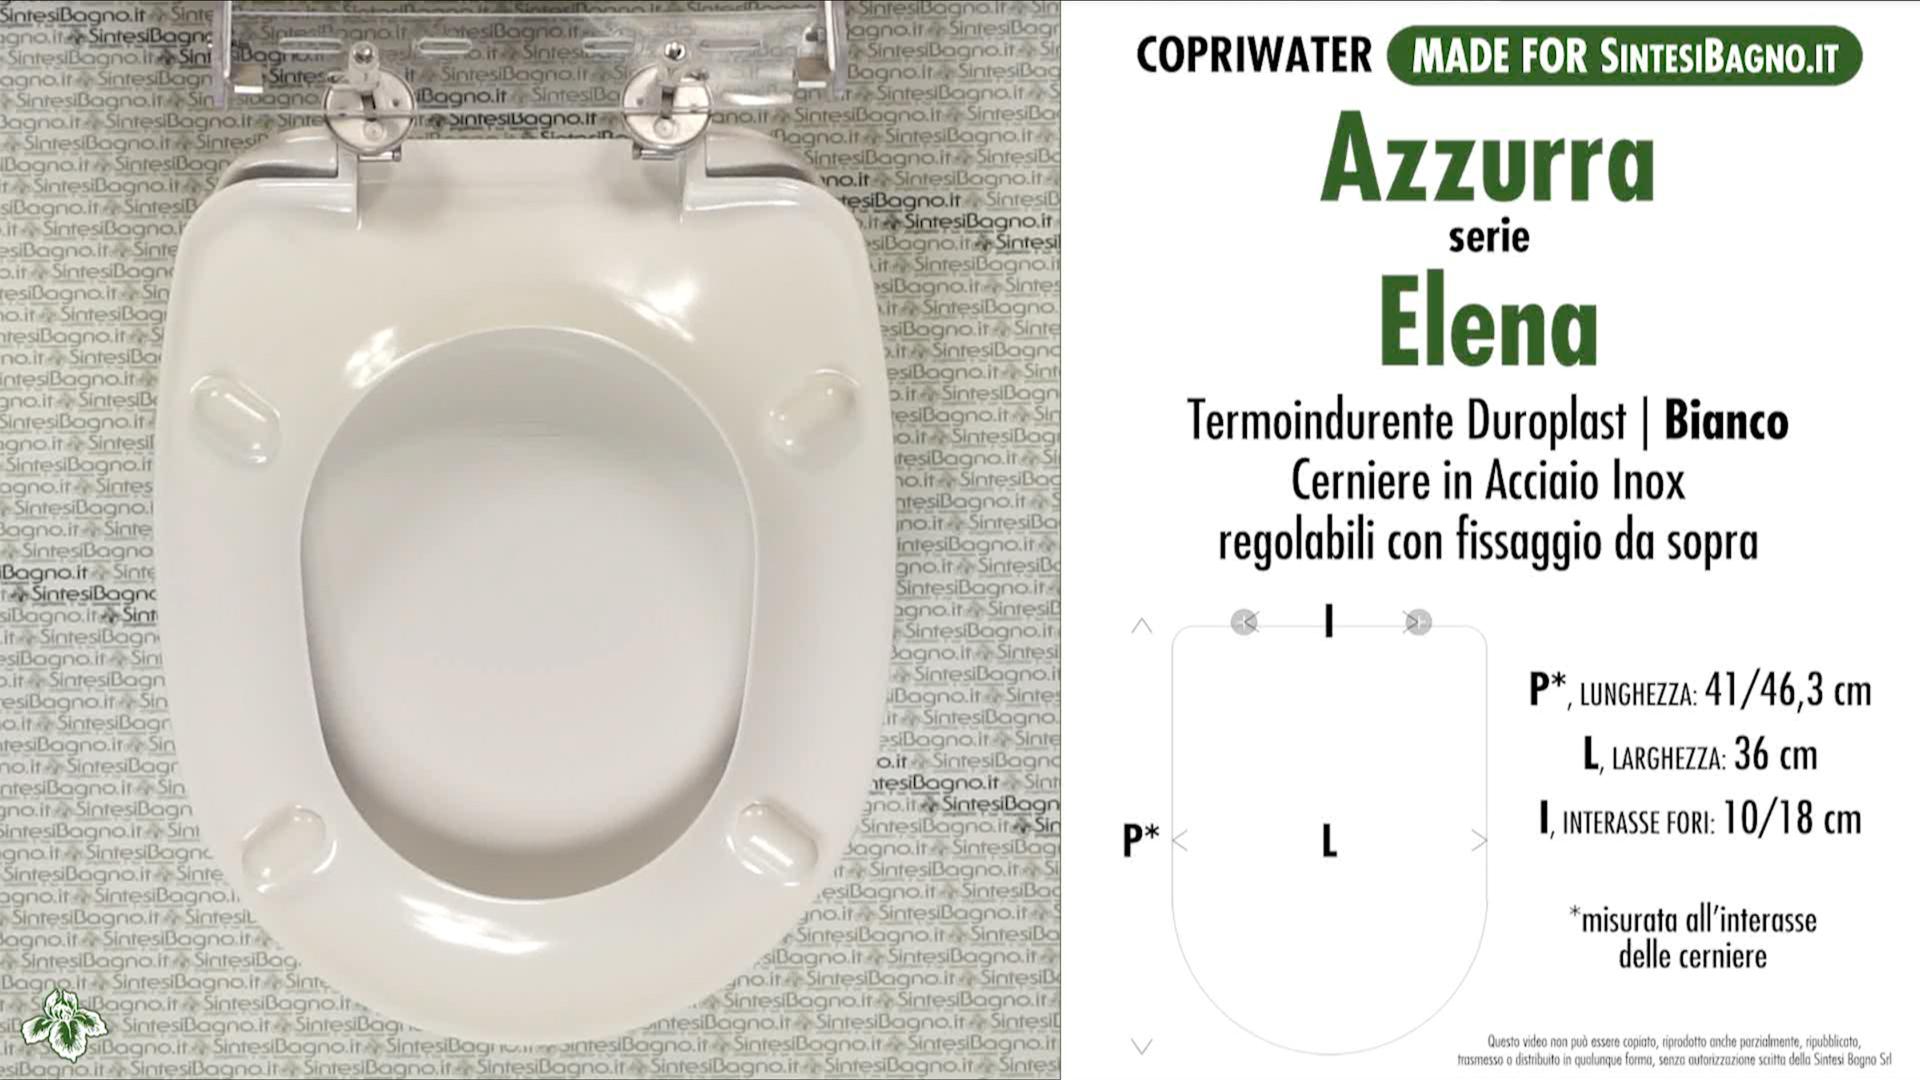 SCHEDA TECNICA MISURE copriwater AZZURRA ELENA